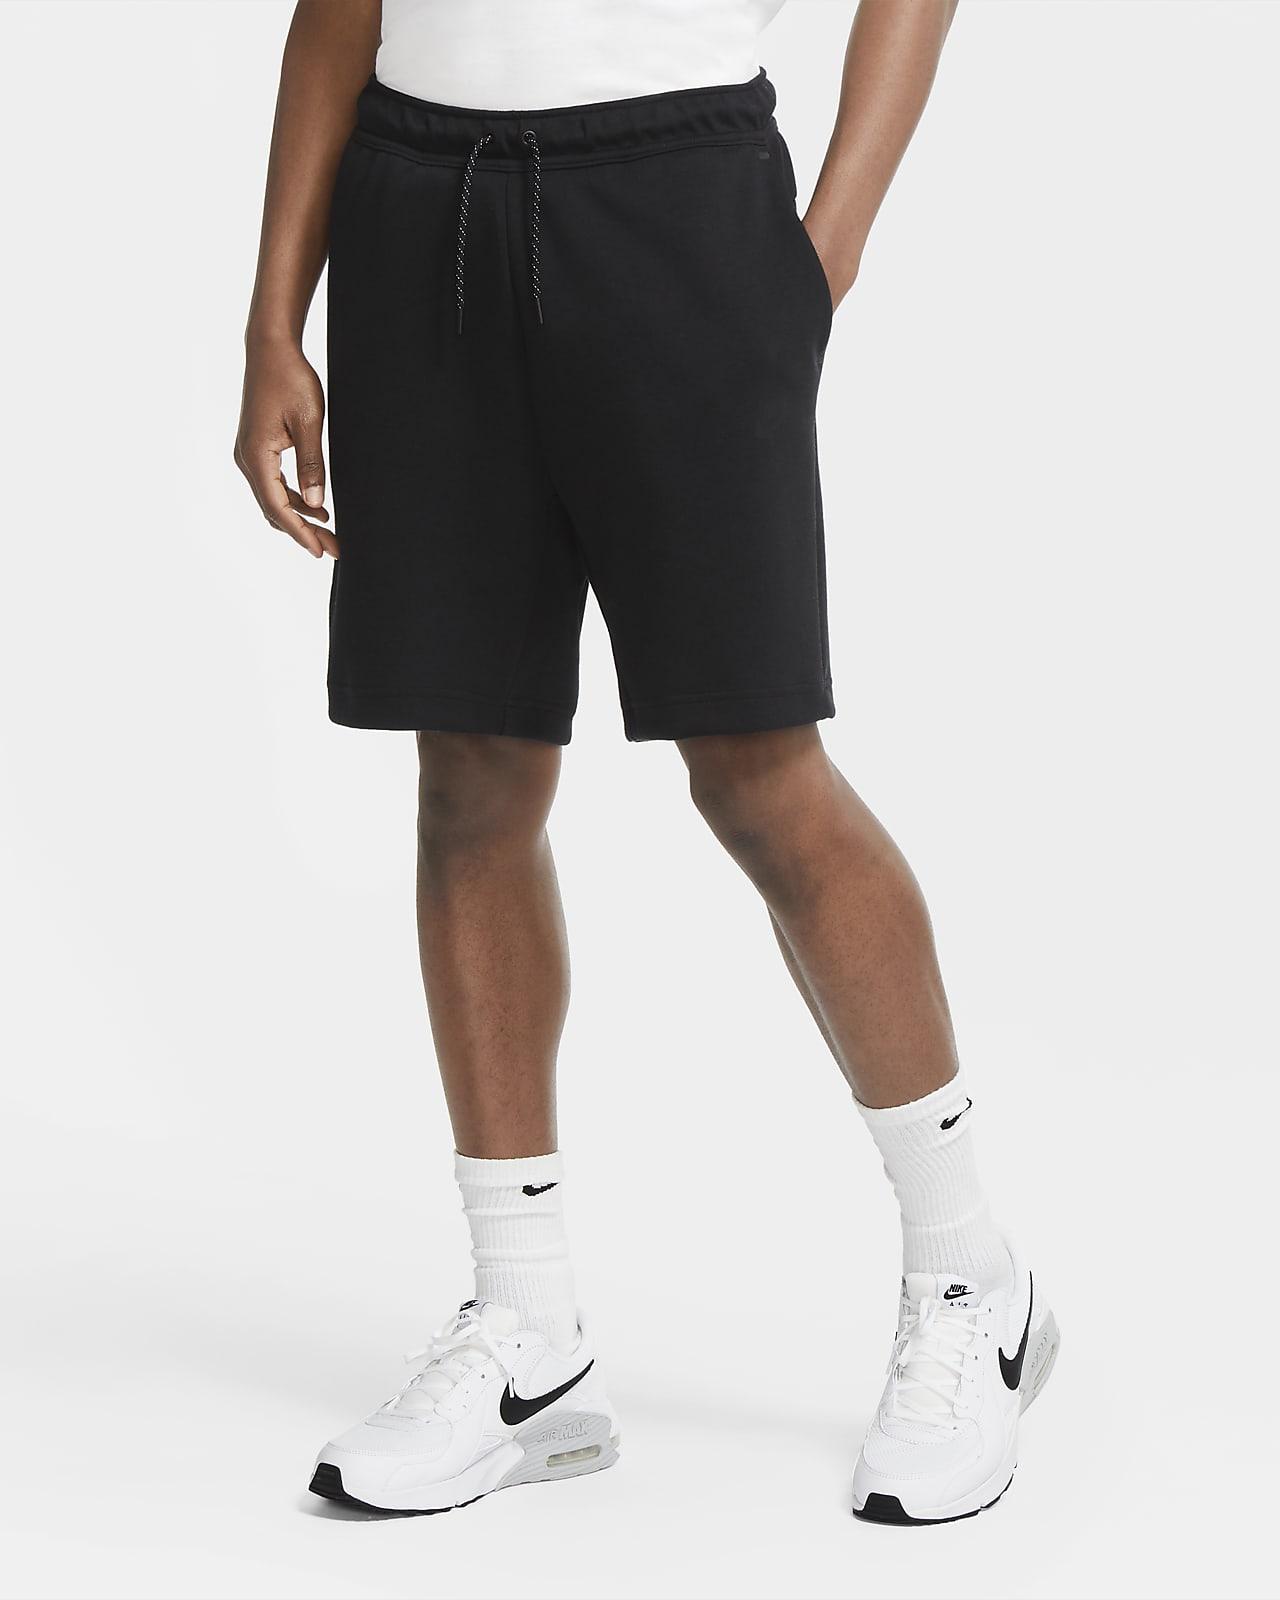 Shorts Nike Sportswear Tech Fleece för män